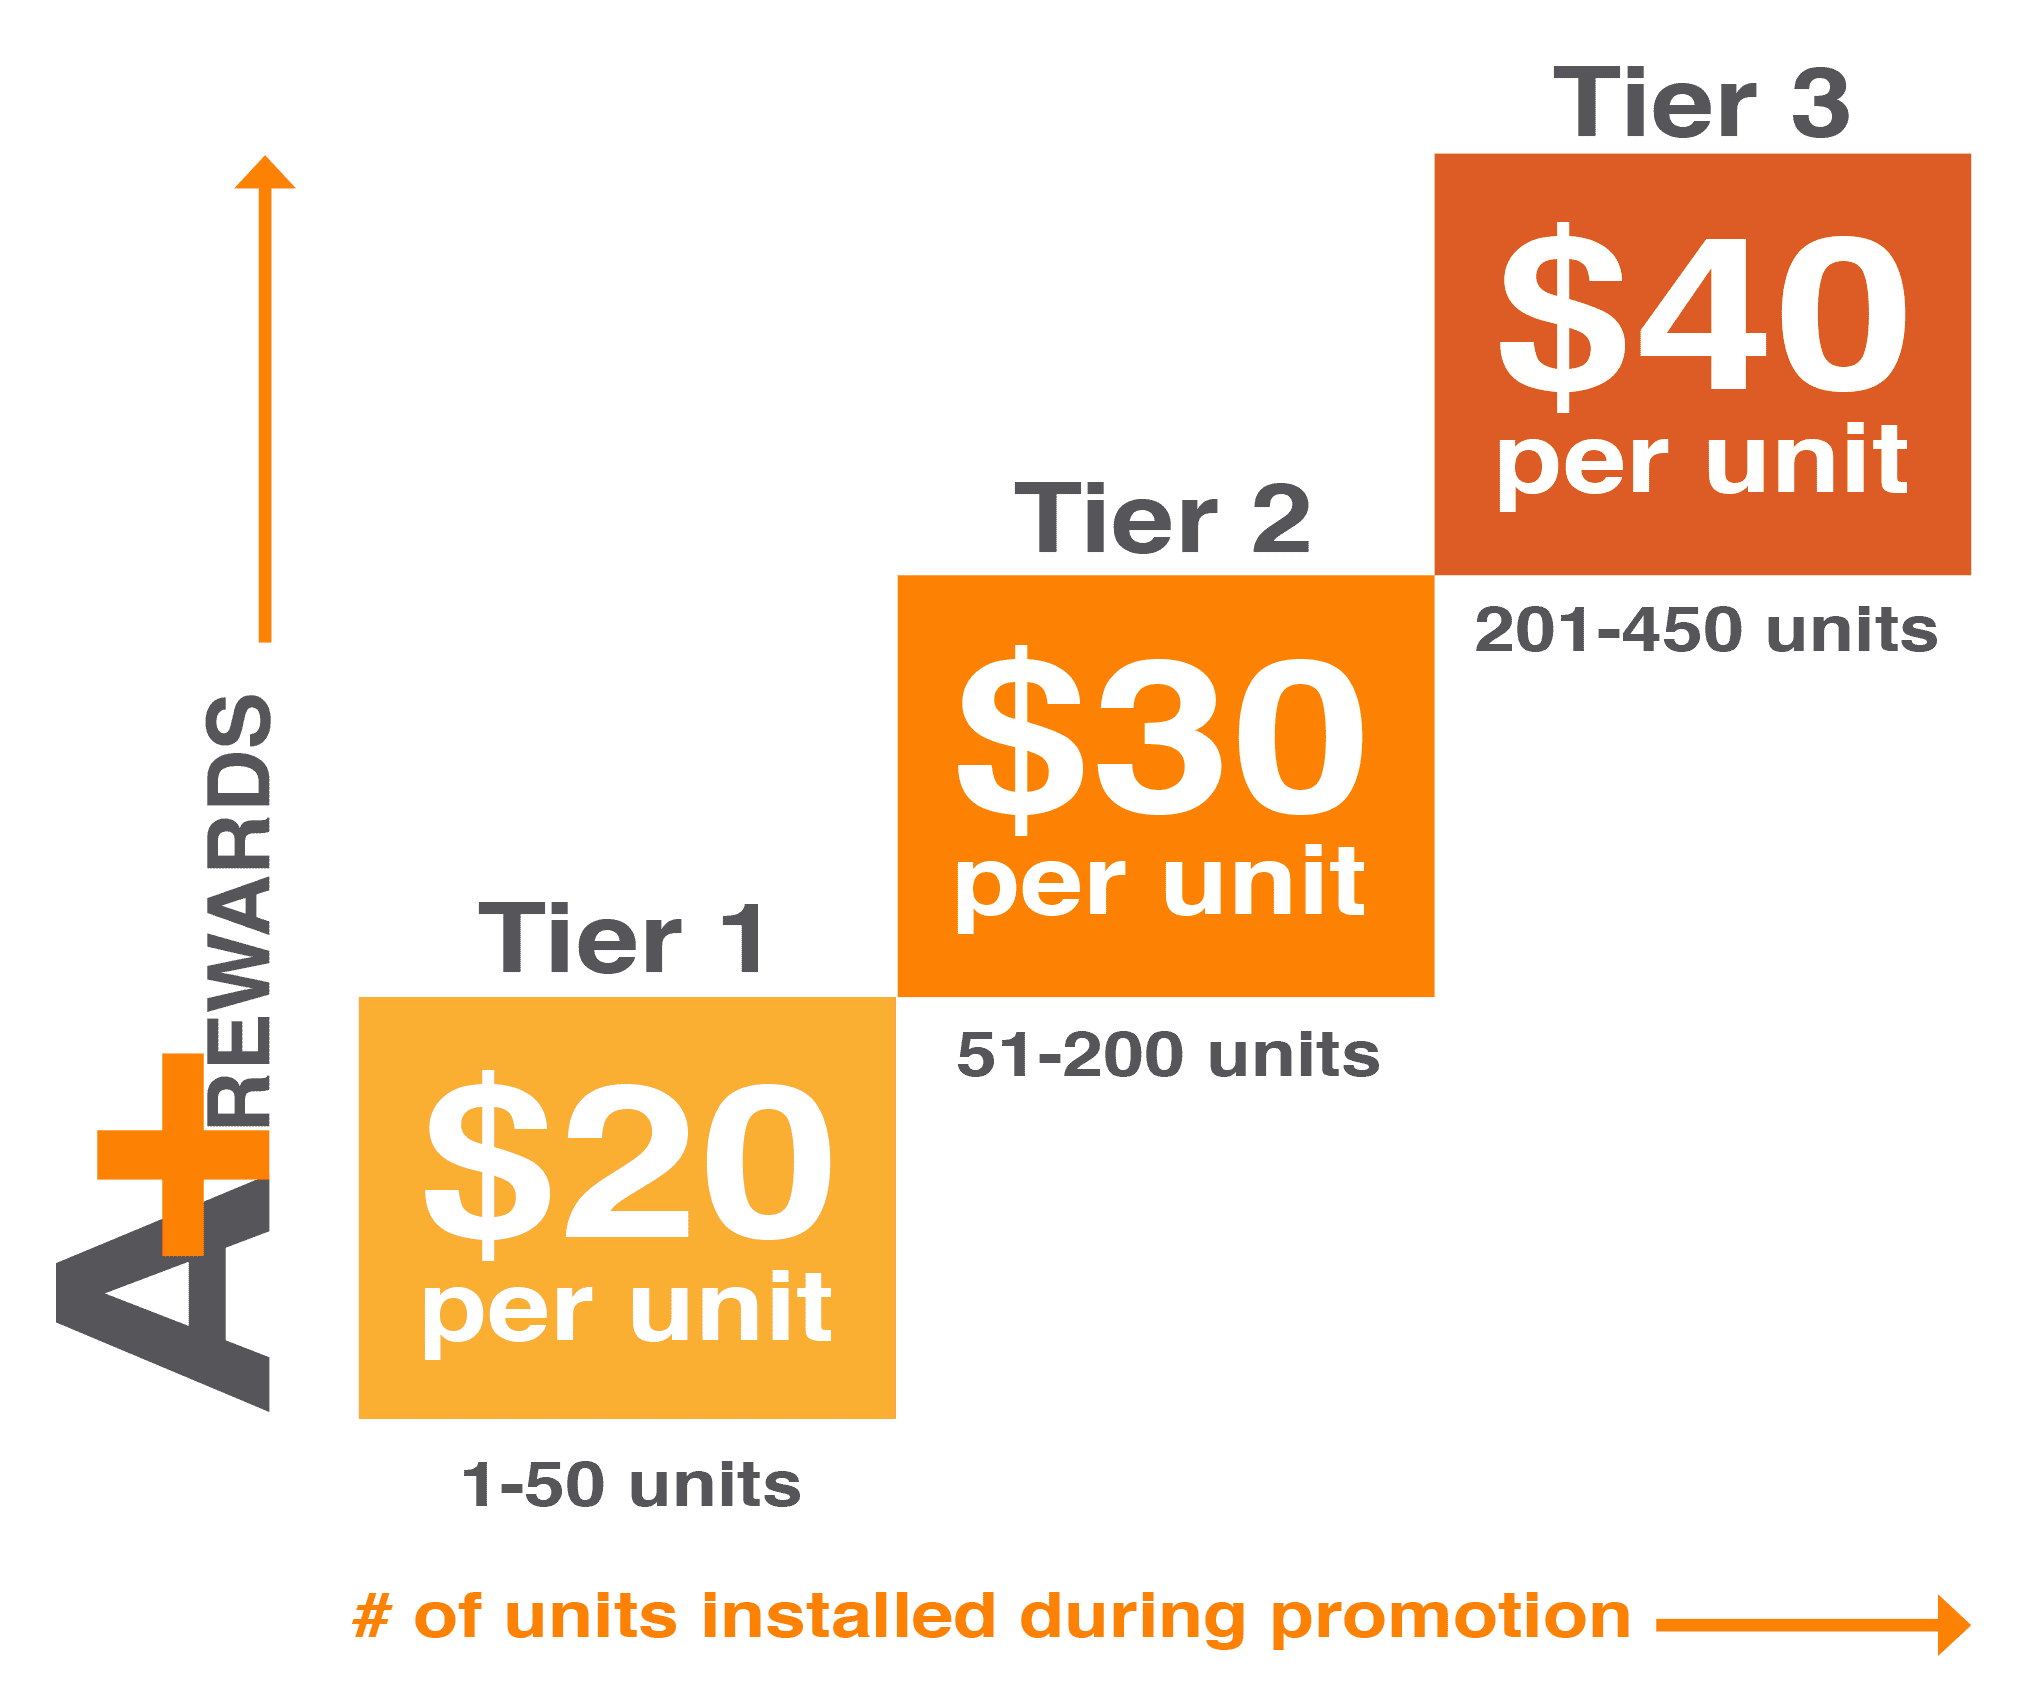 geico total reward program Full-time geico associates are offered a comprehensive total rewards program , including: 401(k) and profit-sharing plans medical, dental.